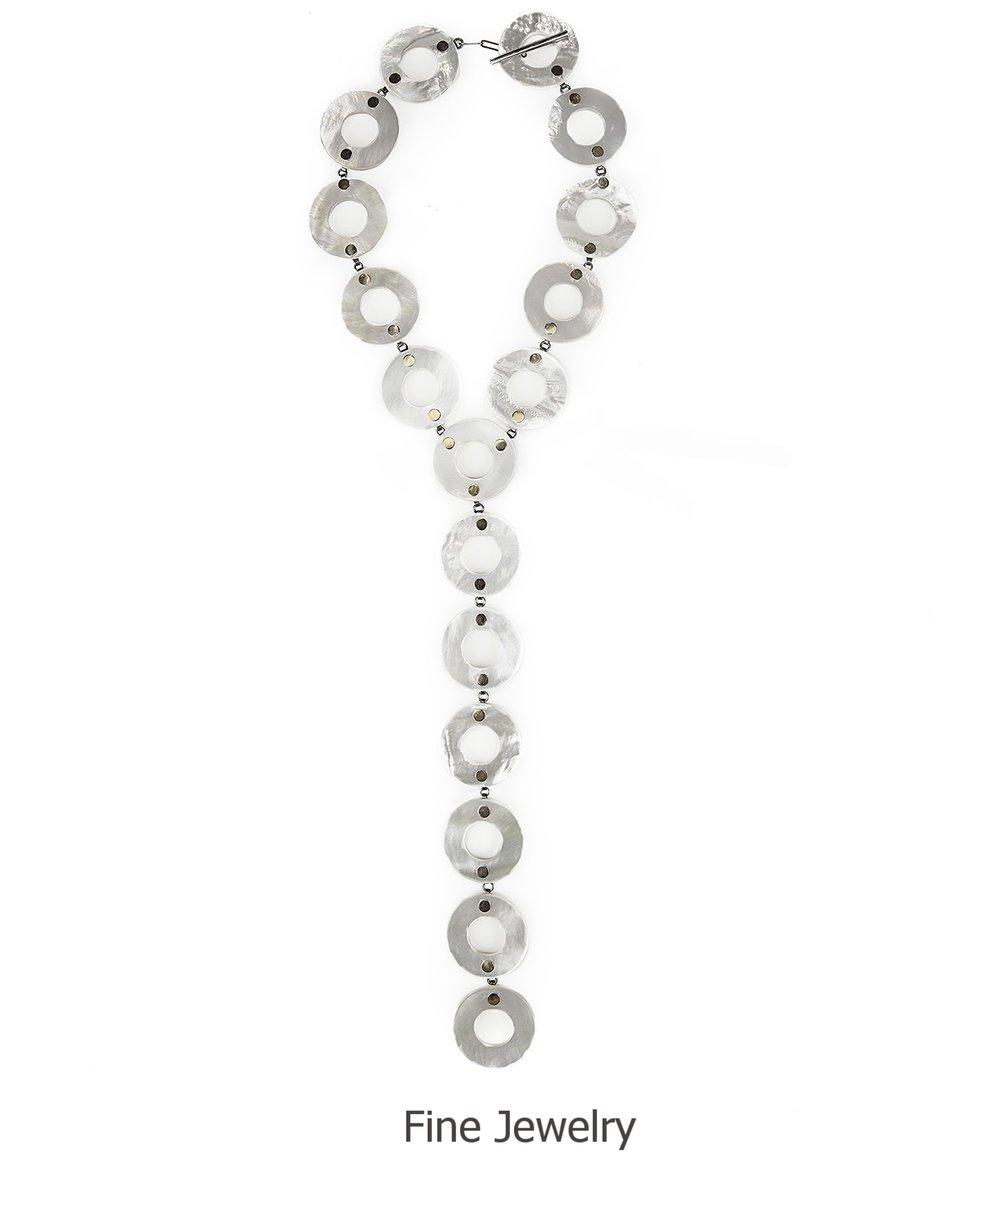 Copy of Mariana Antinori Fine Jewelry